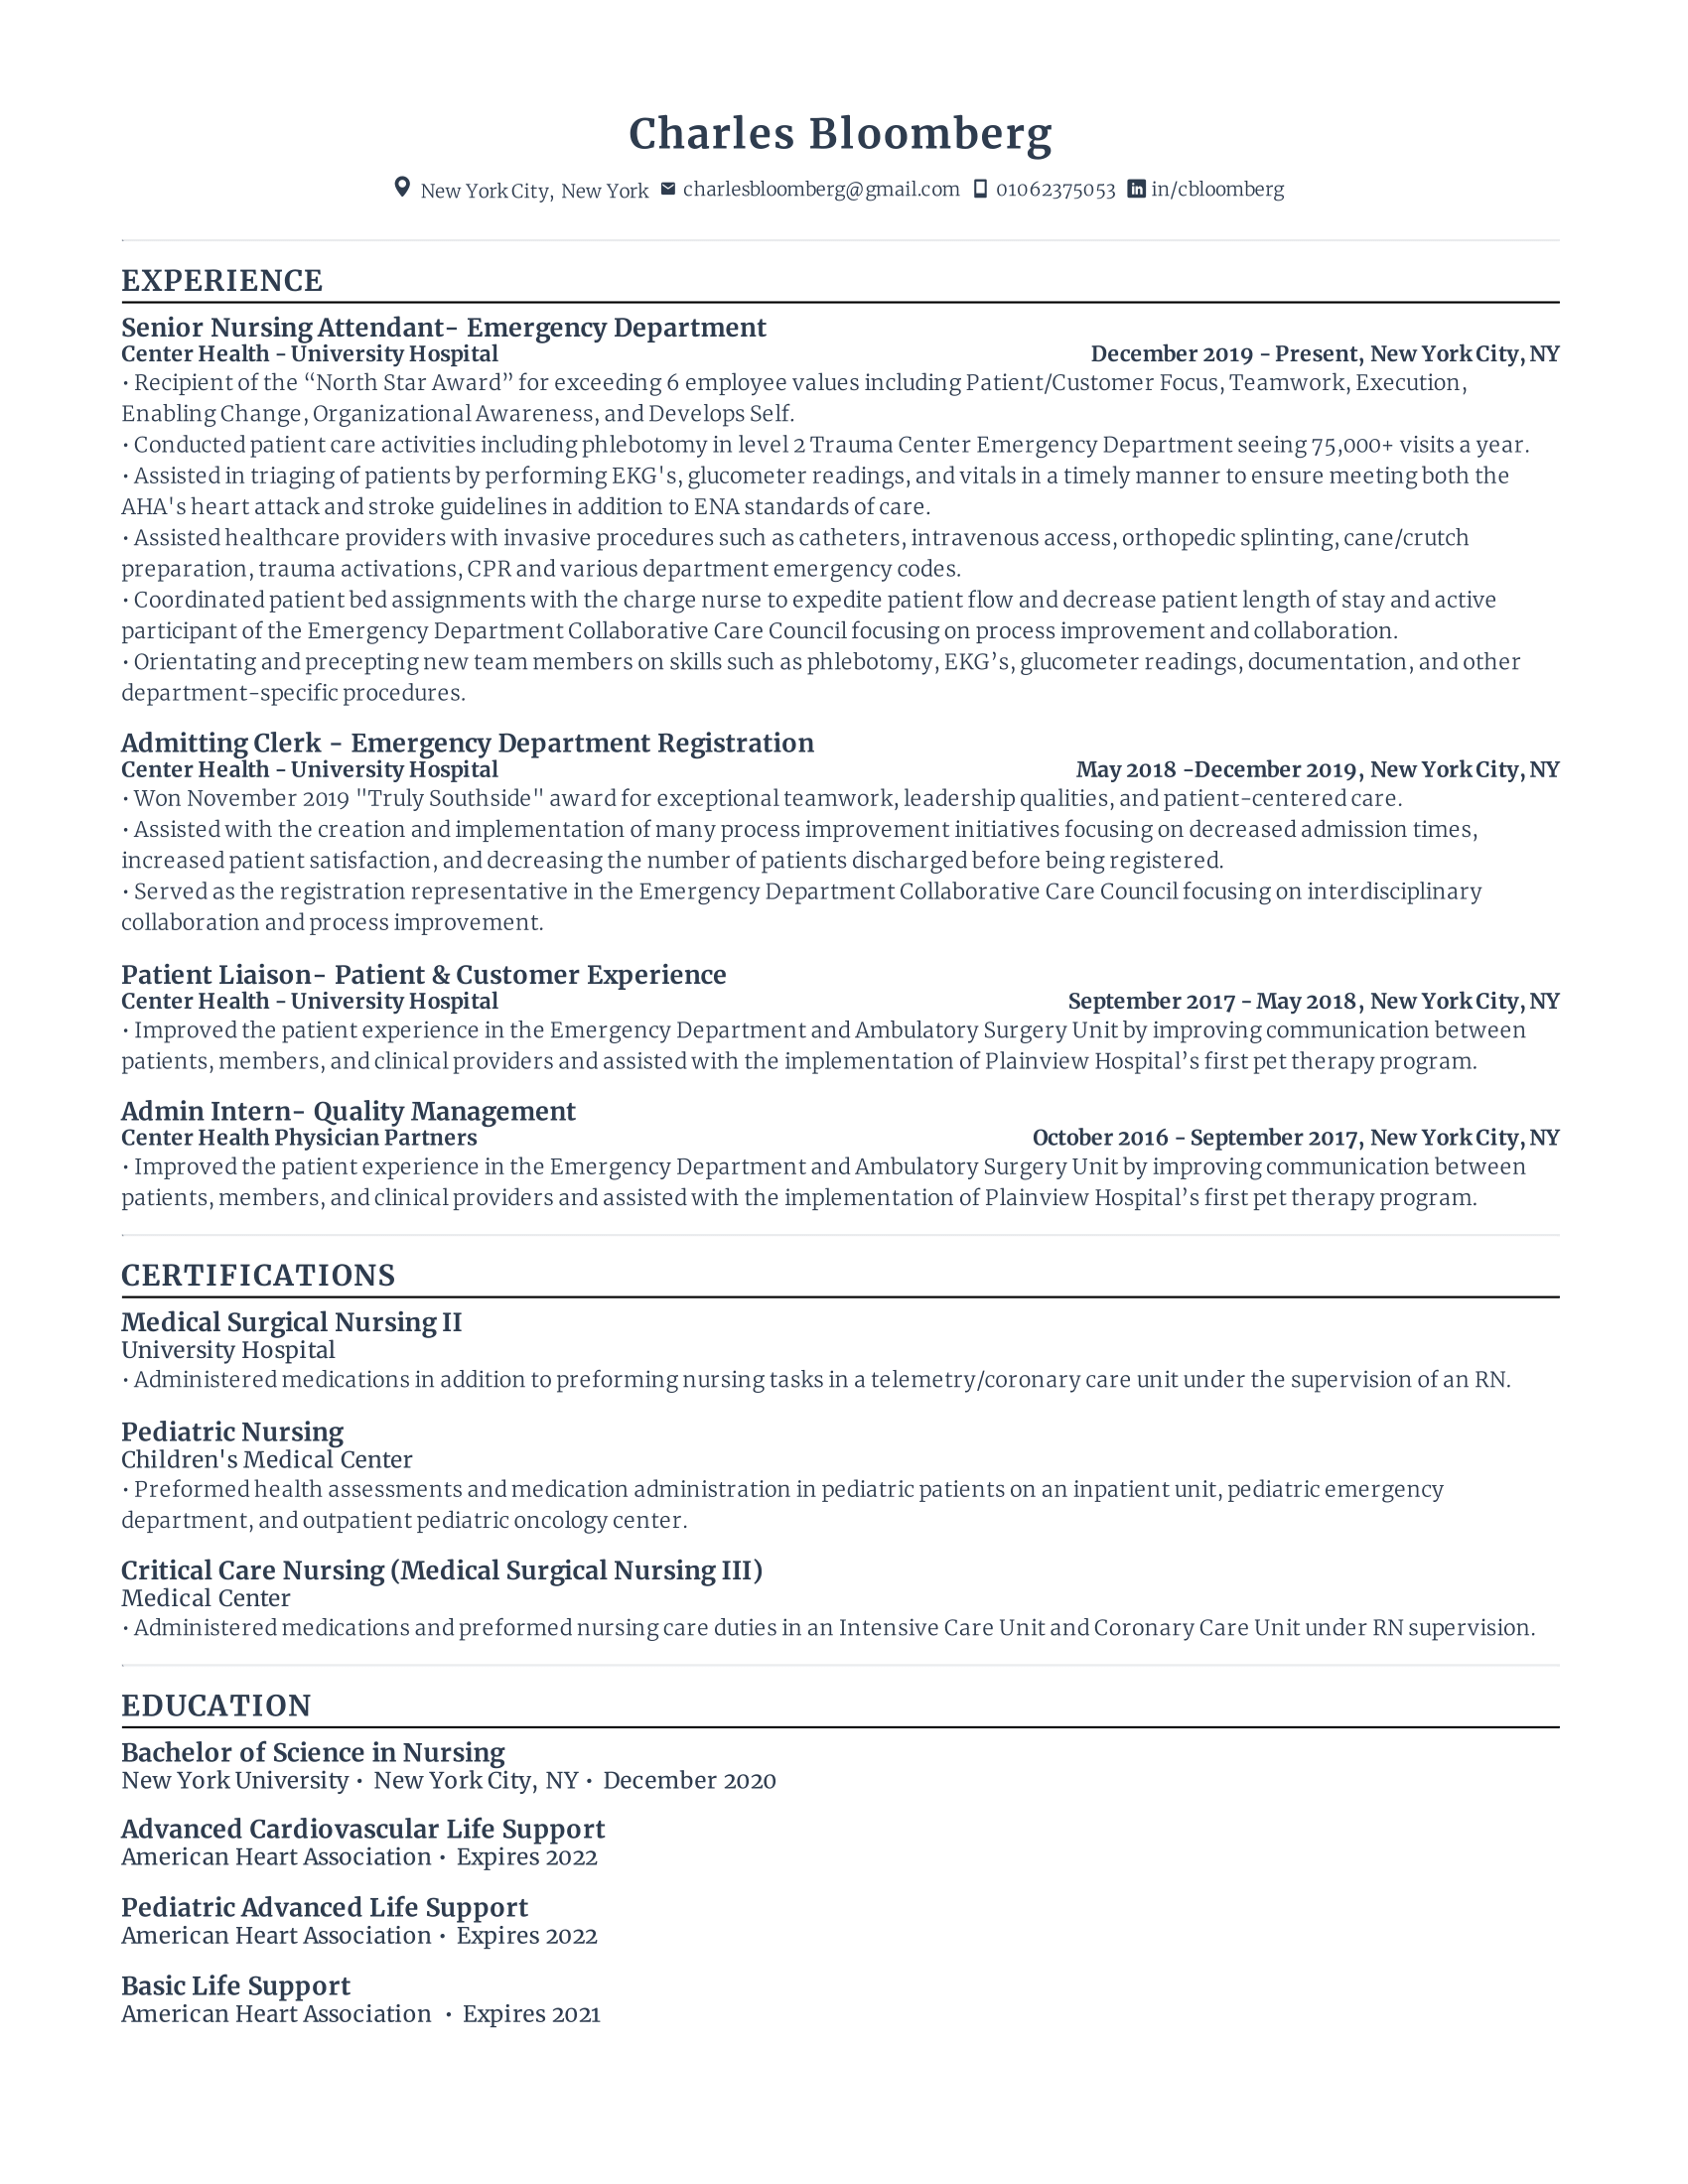 Nurse Resume